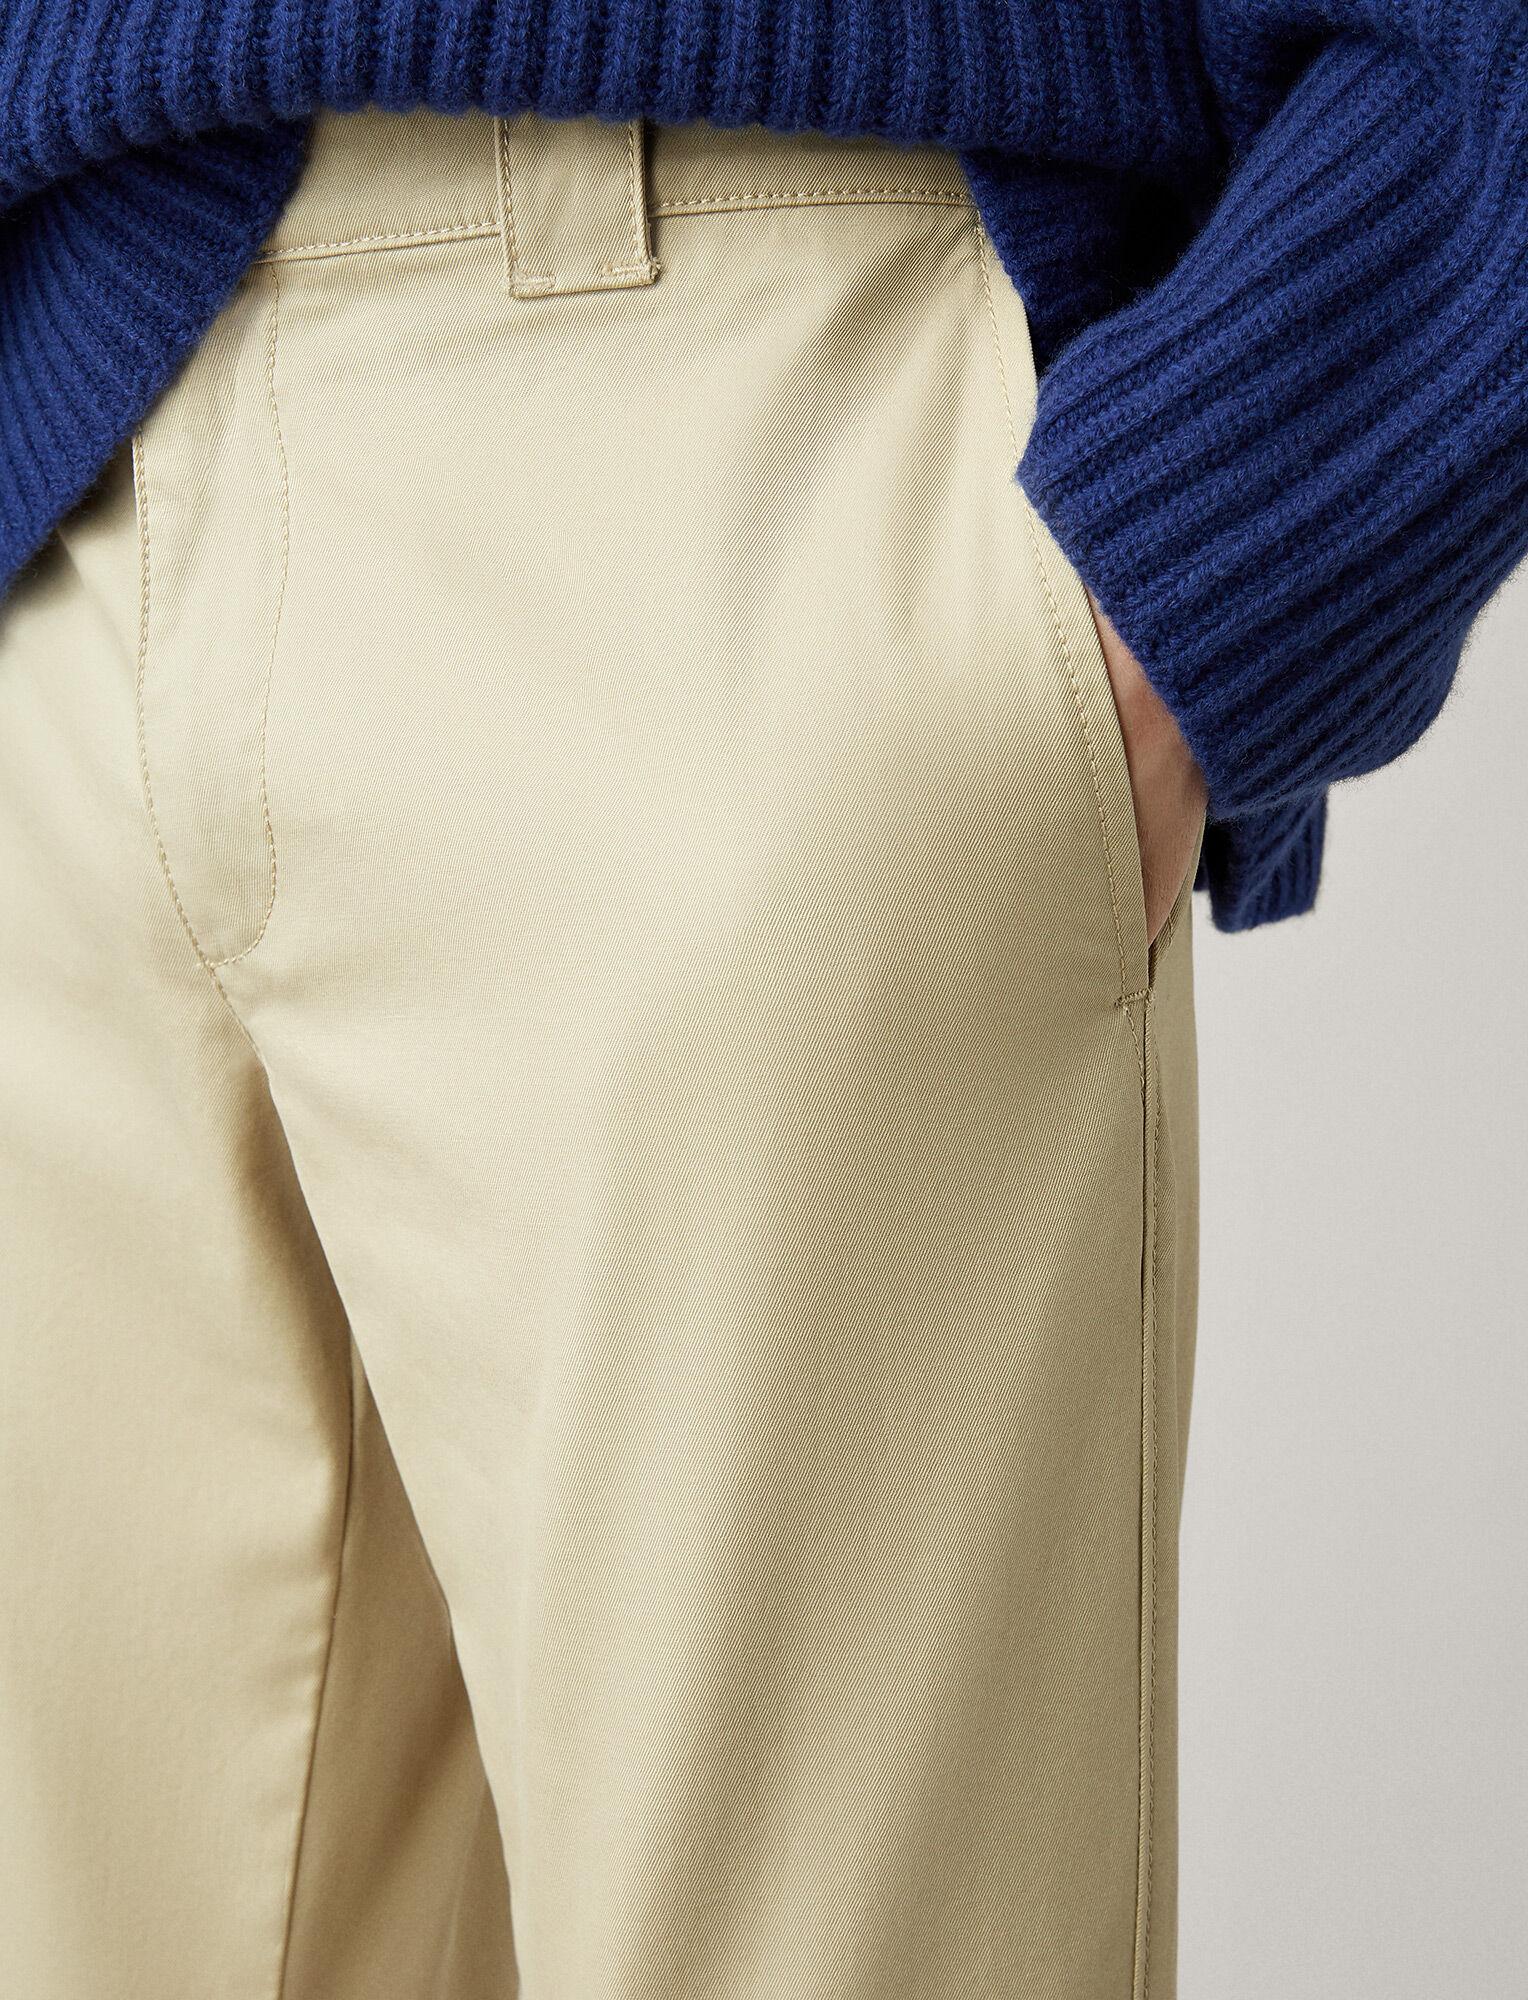 Joseph, Pantalon de travail Weymouth en twill, in SAND